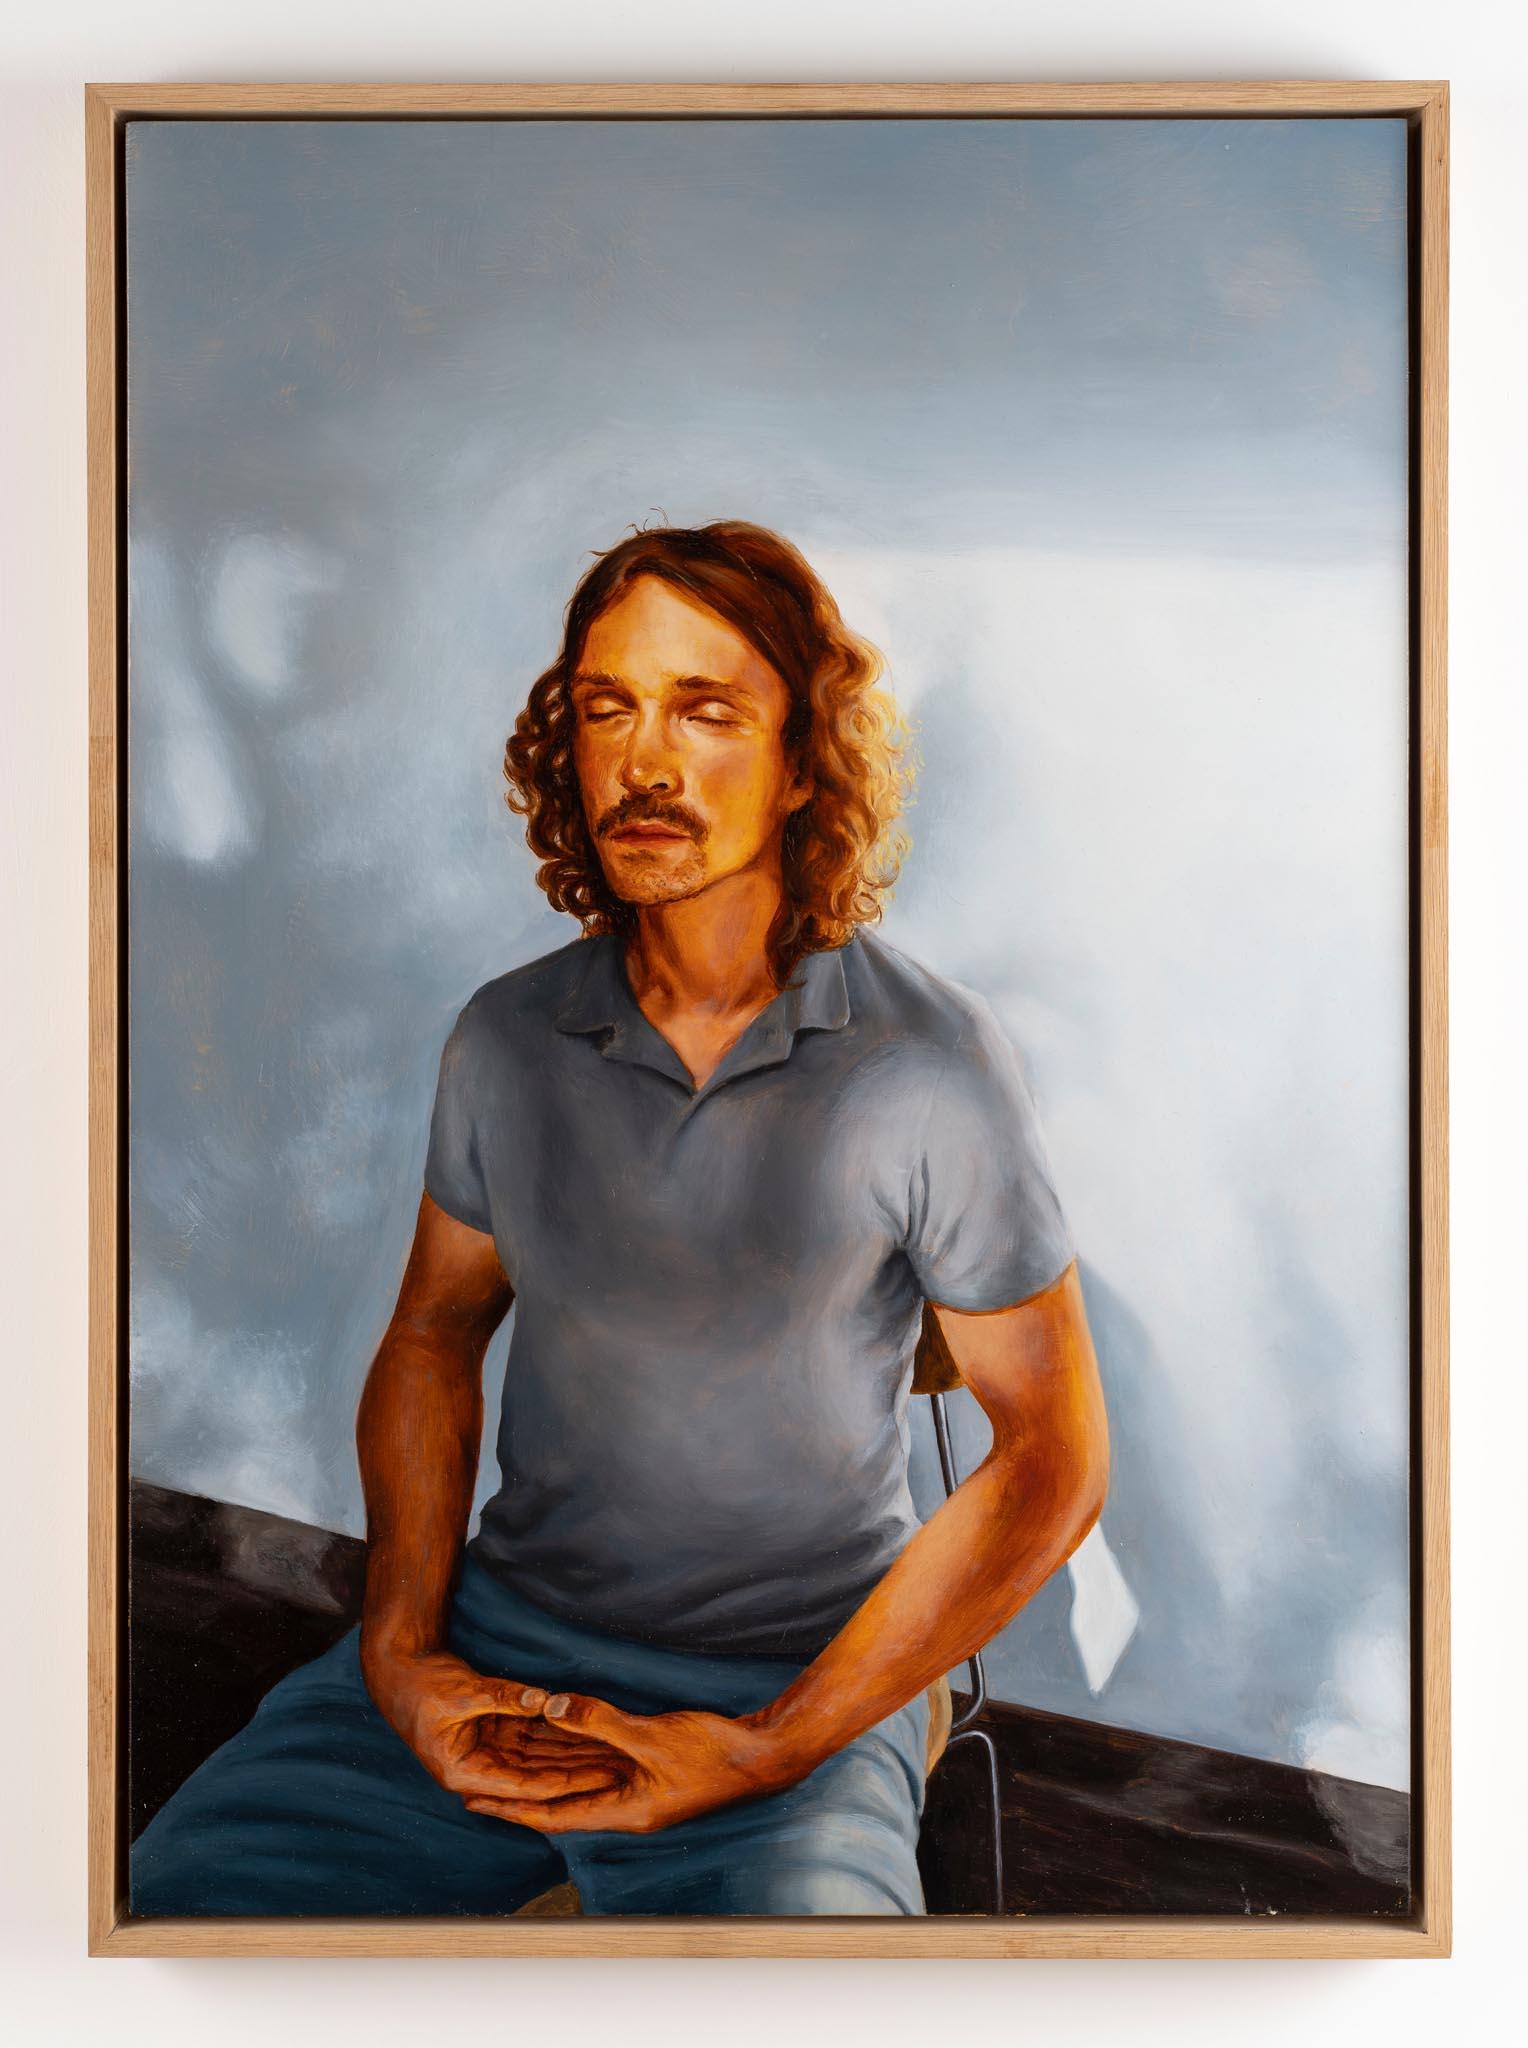 Daniel - Oil on canvas, 50x70 cm, 2019